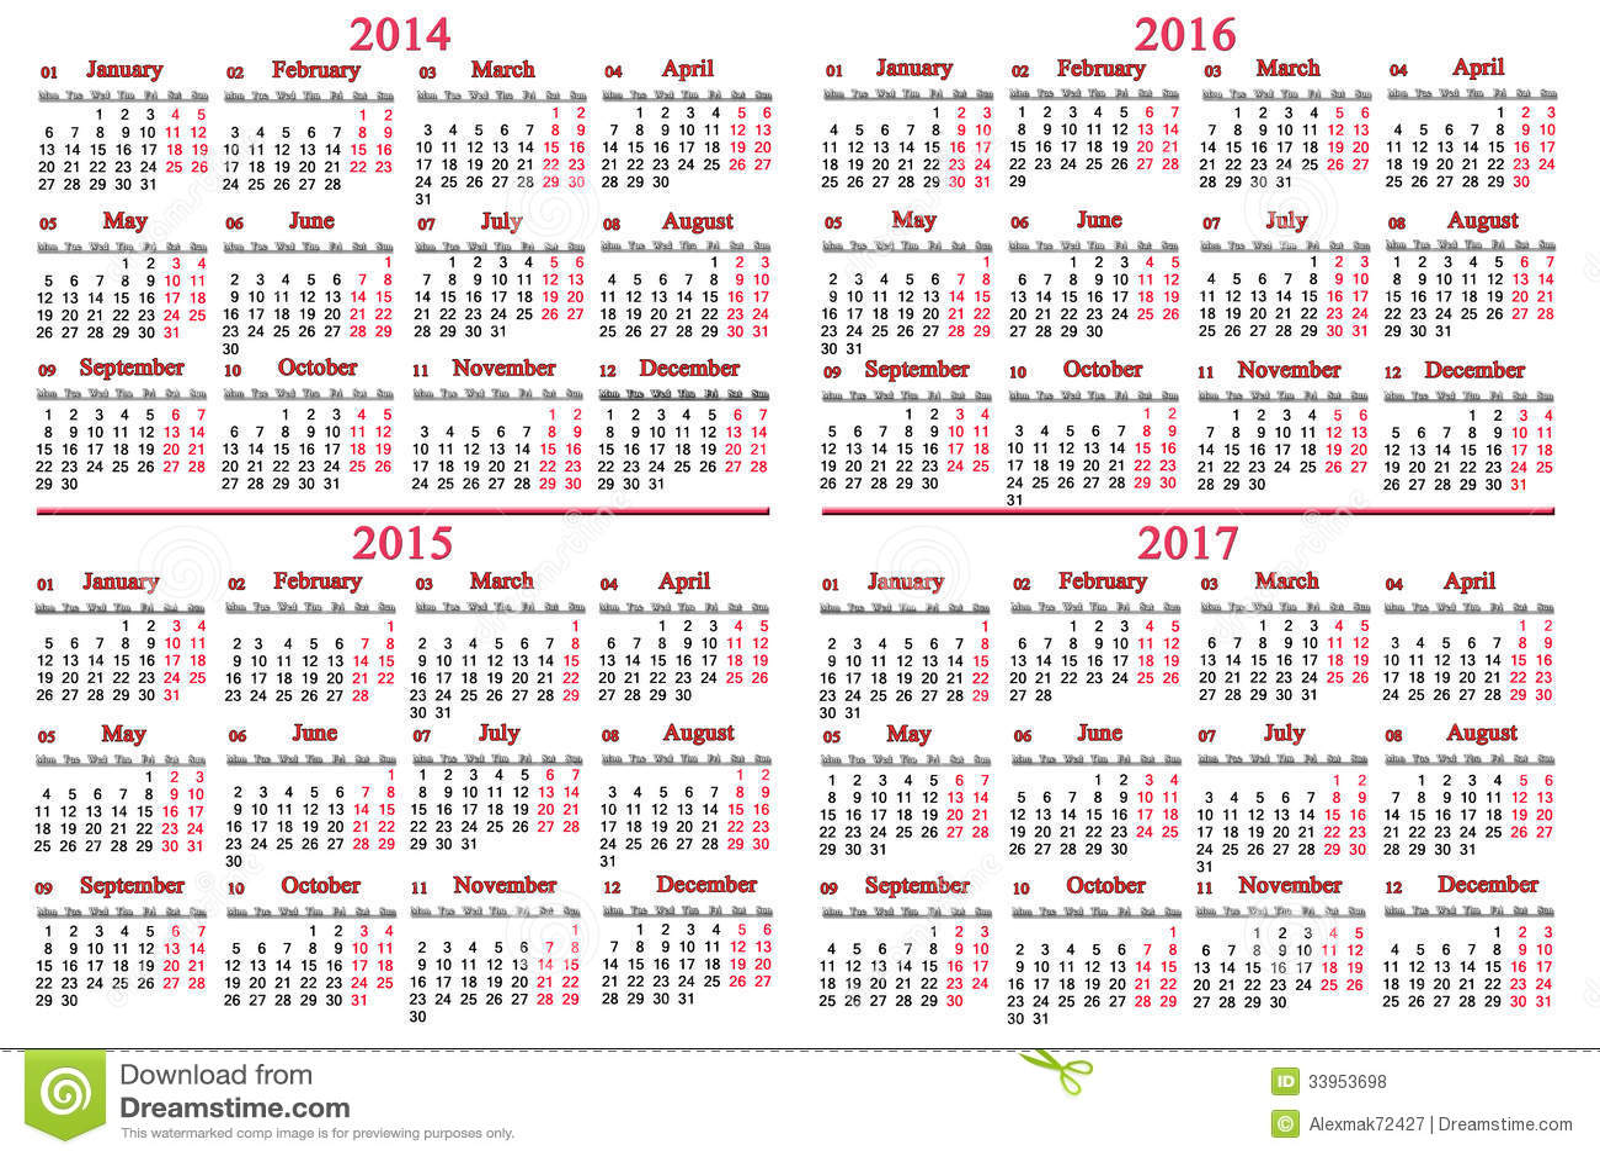 Jewish Perpetual Calendar The Jewish Calendar Calendars Webexhibits Usual Calendar For 2014 2017 Years Royalty Free Stock